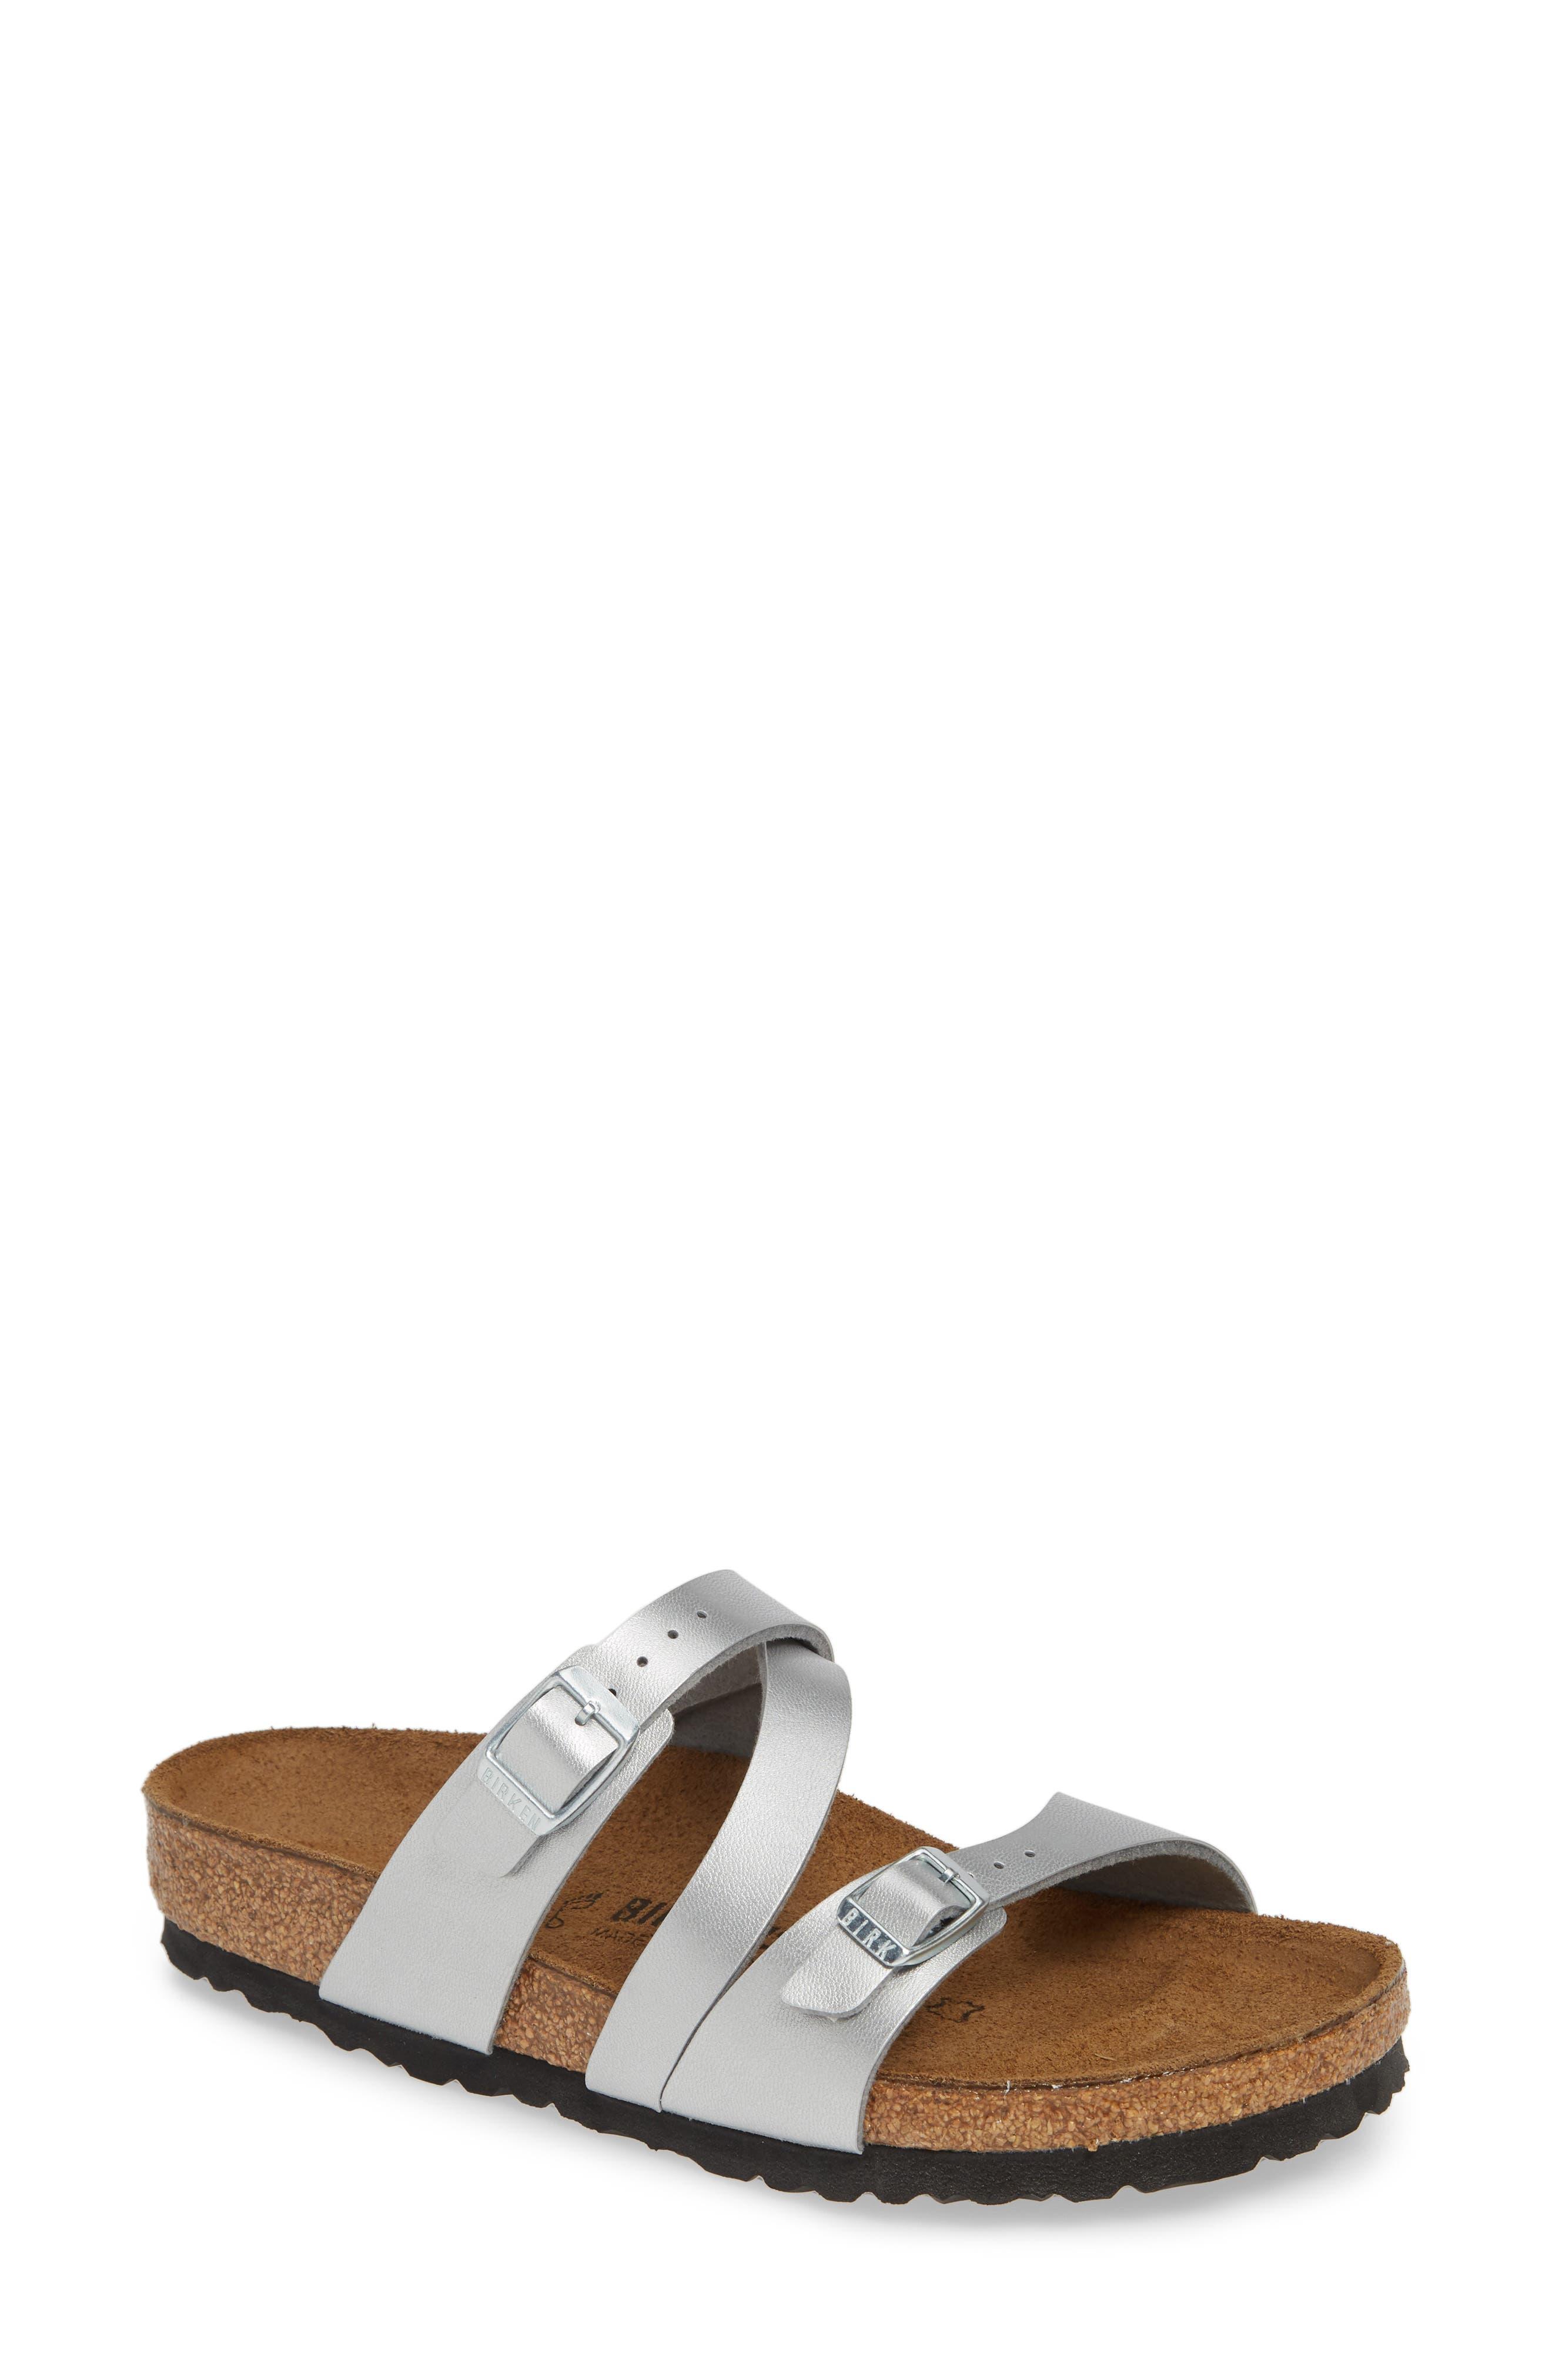 Birkenstock Salina Slide Sandal,7.5 - Metallic